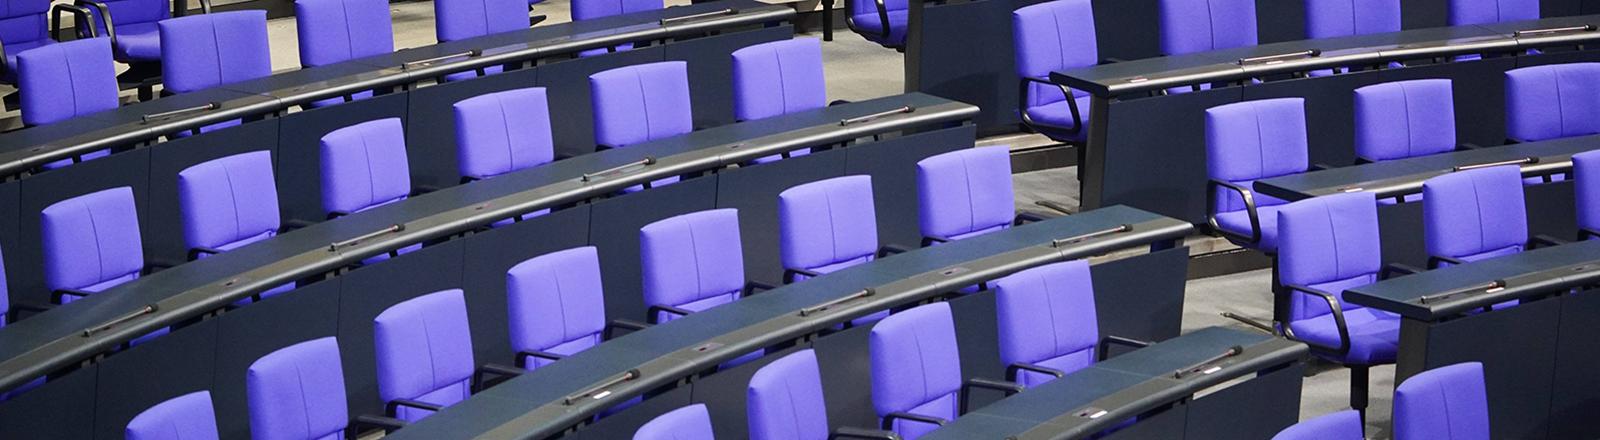 Der leere Bundestag